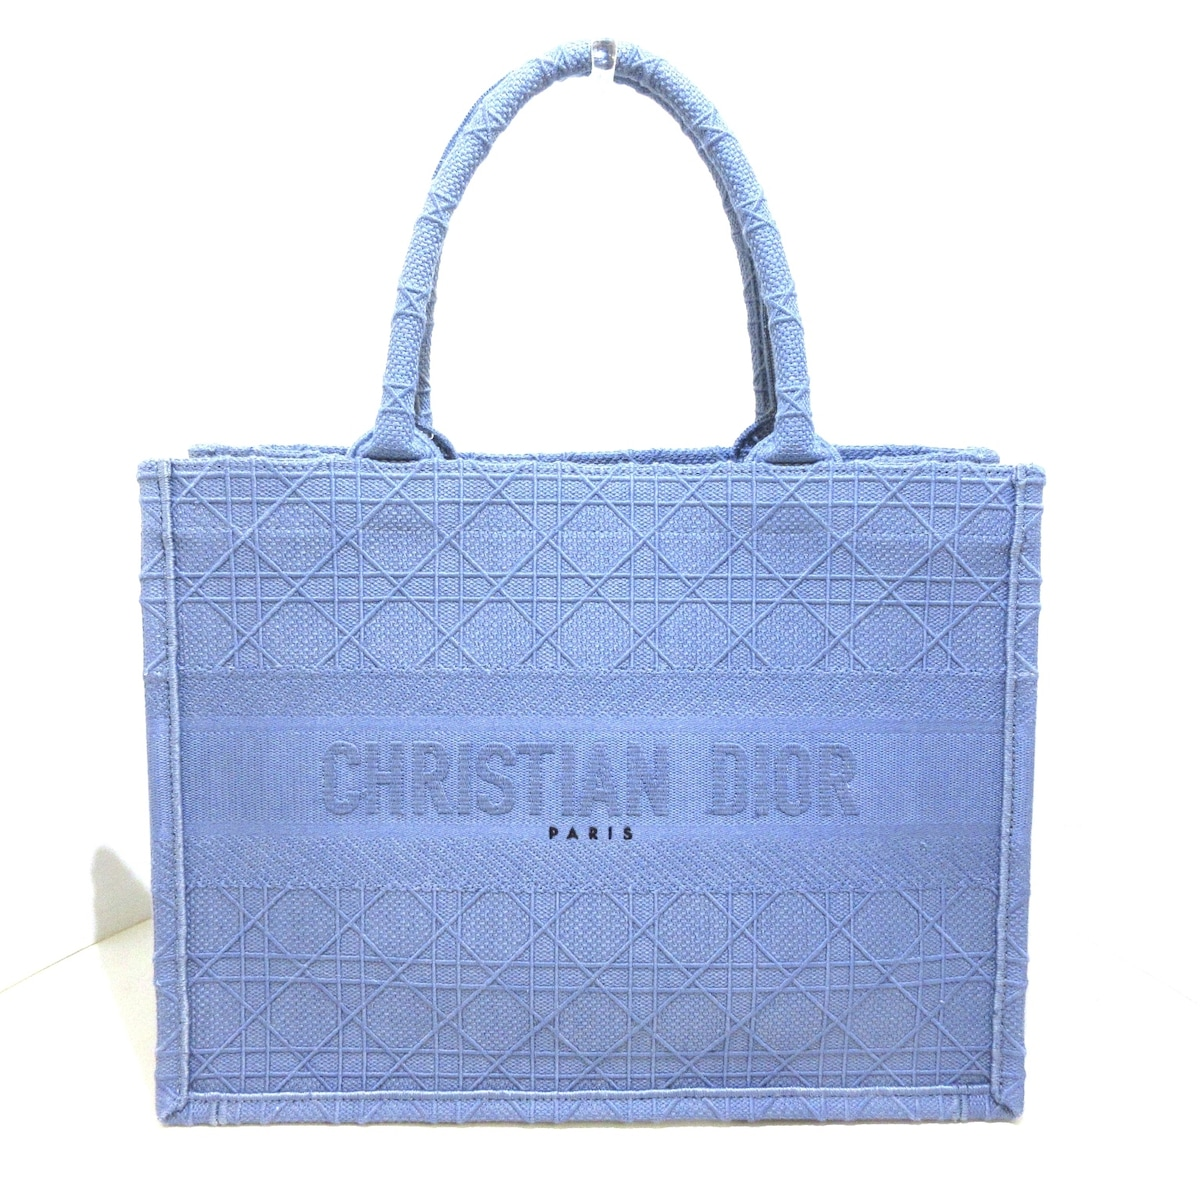 DIOR/ChristianDior(ディオール/クリスチャンディオール)のブックトート スモールバッグ/カナージュ